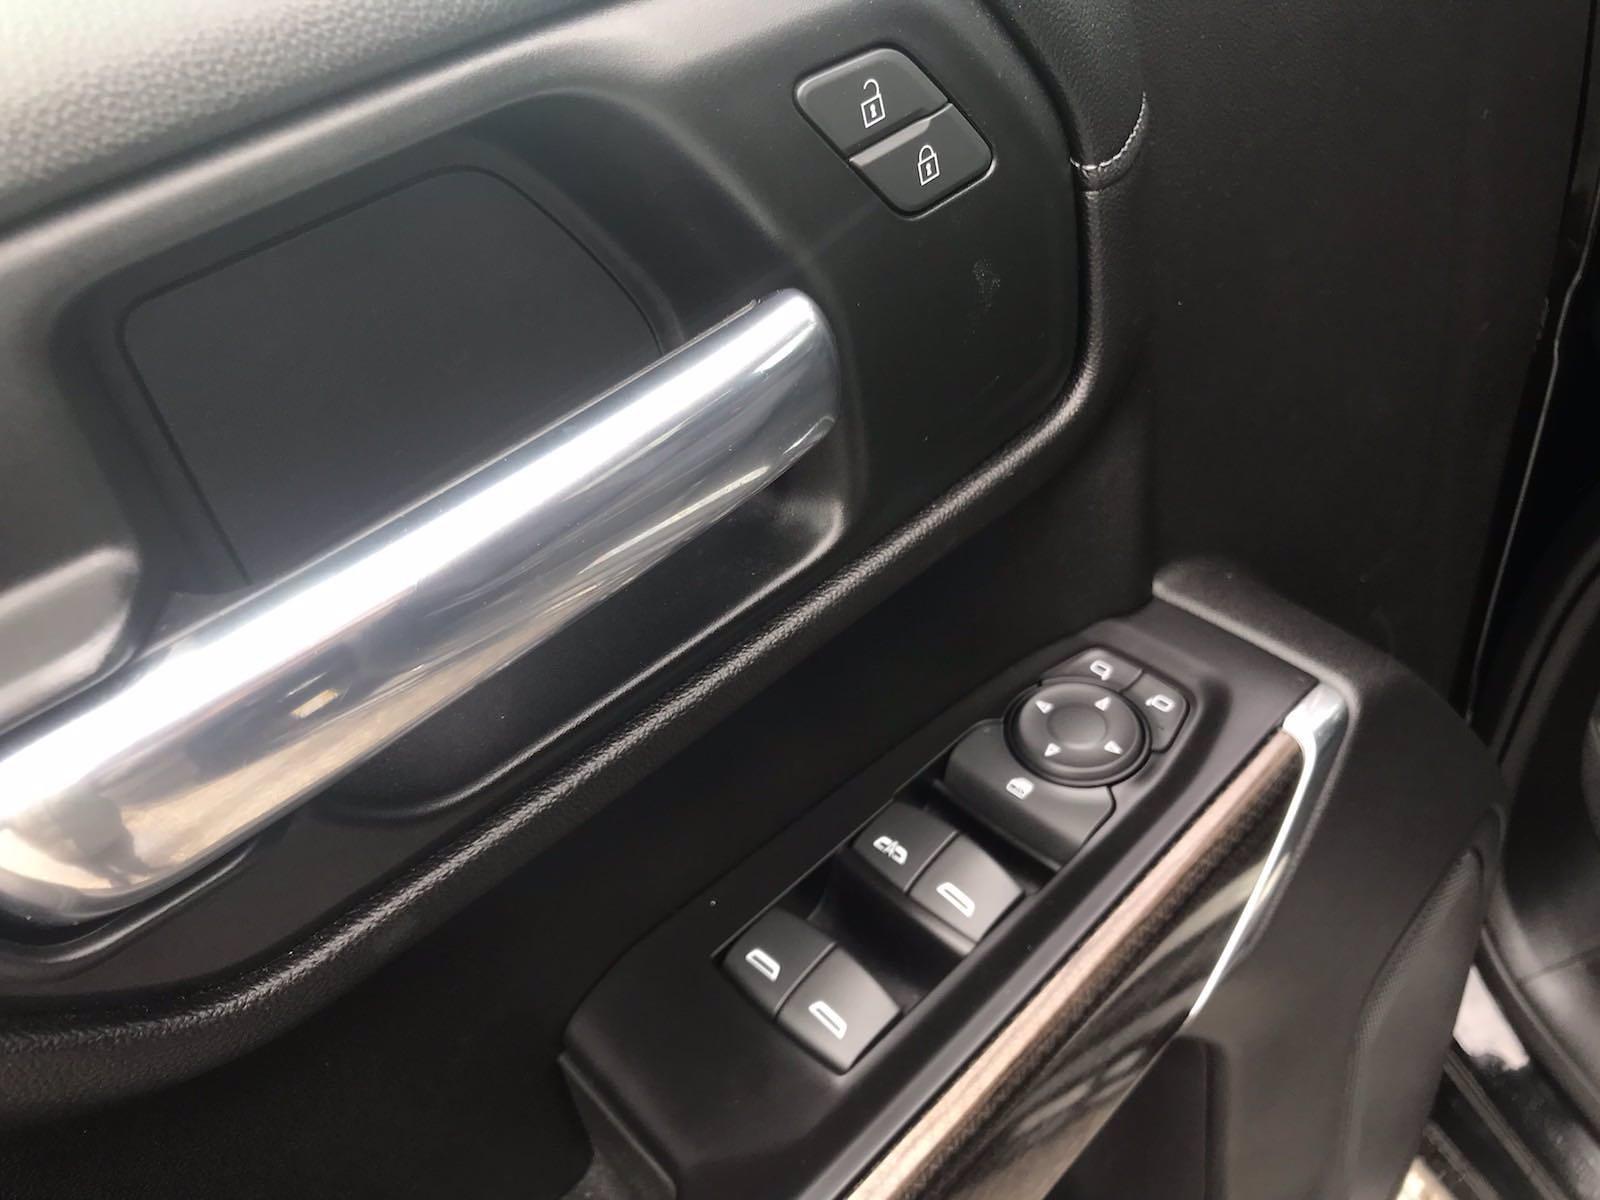 2020 Chevrolet Silverado 1500 Crew Cab 4x4, Pickup #16458PN - photo 23